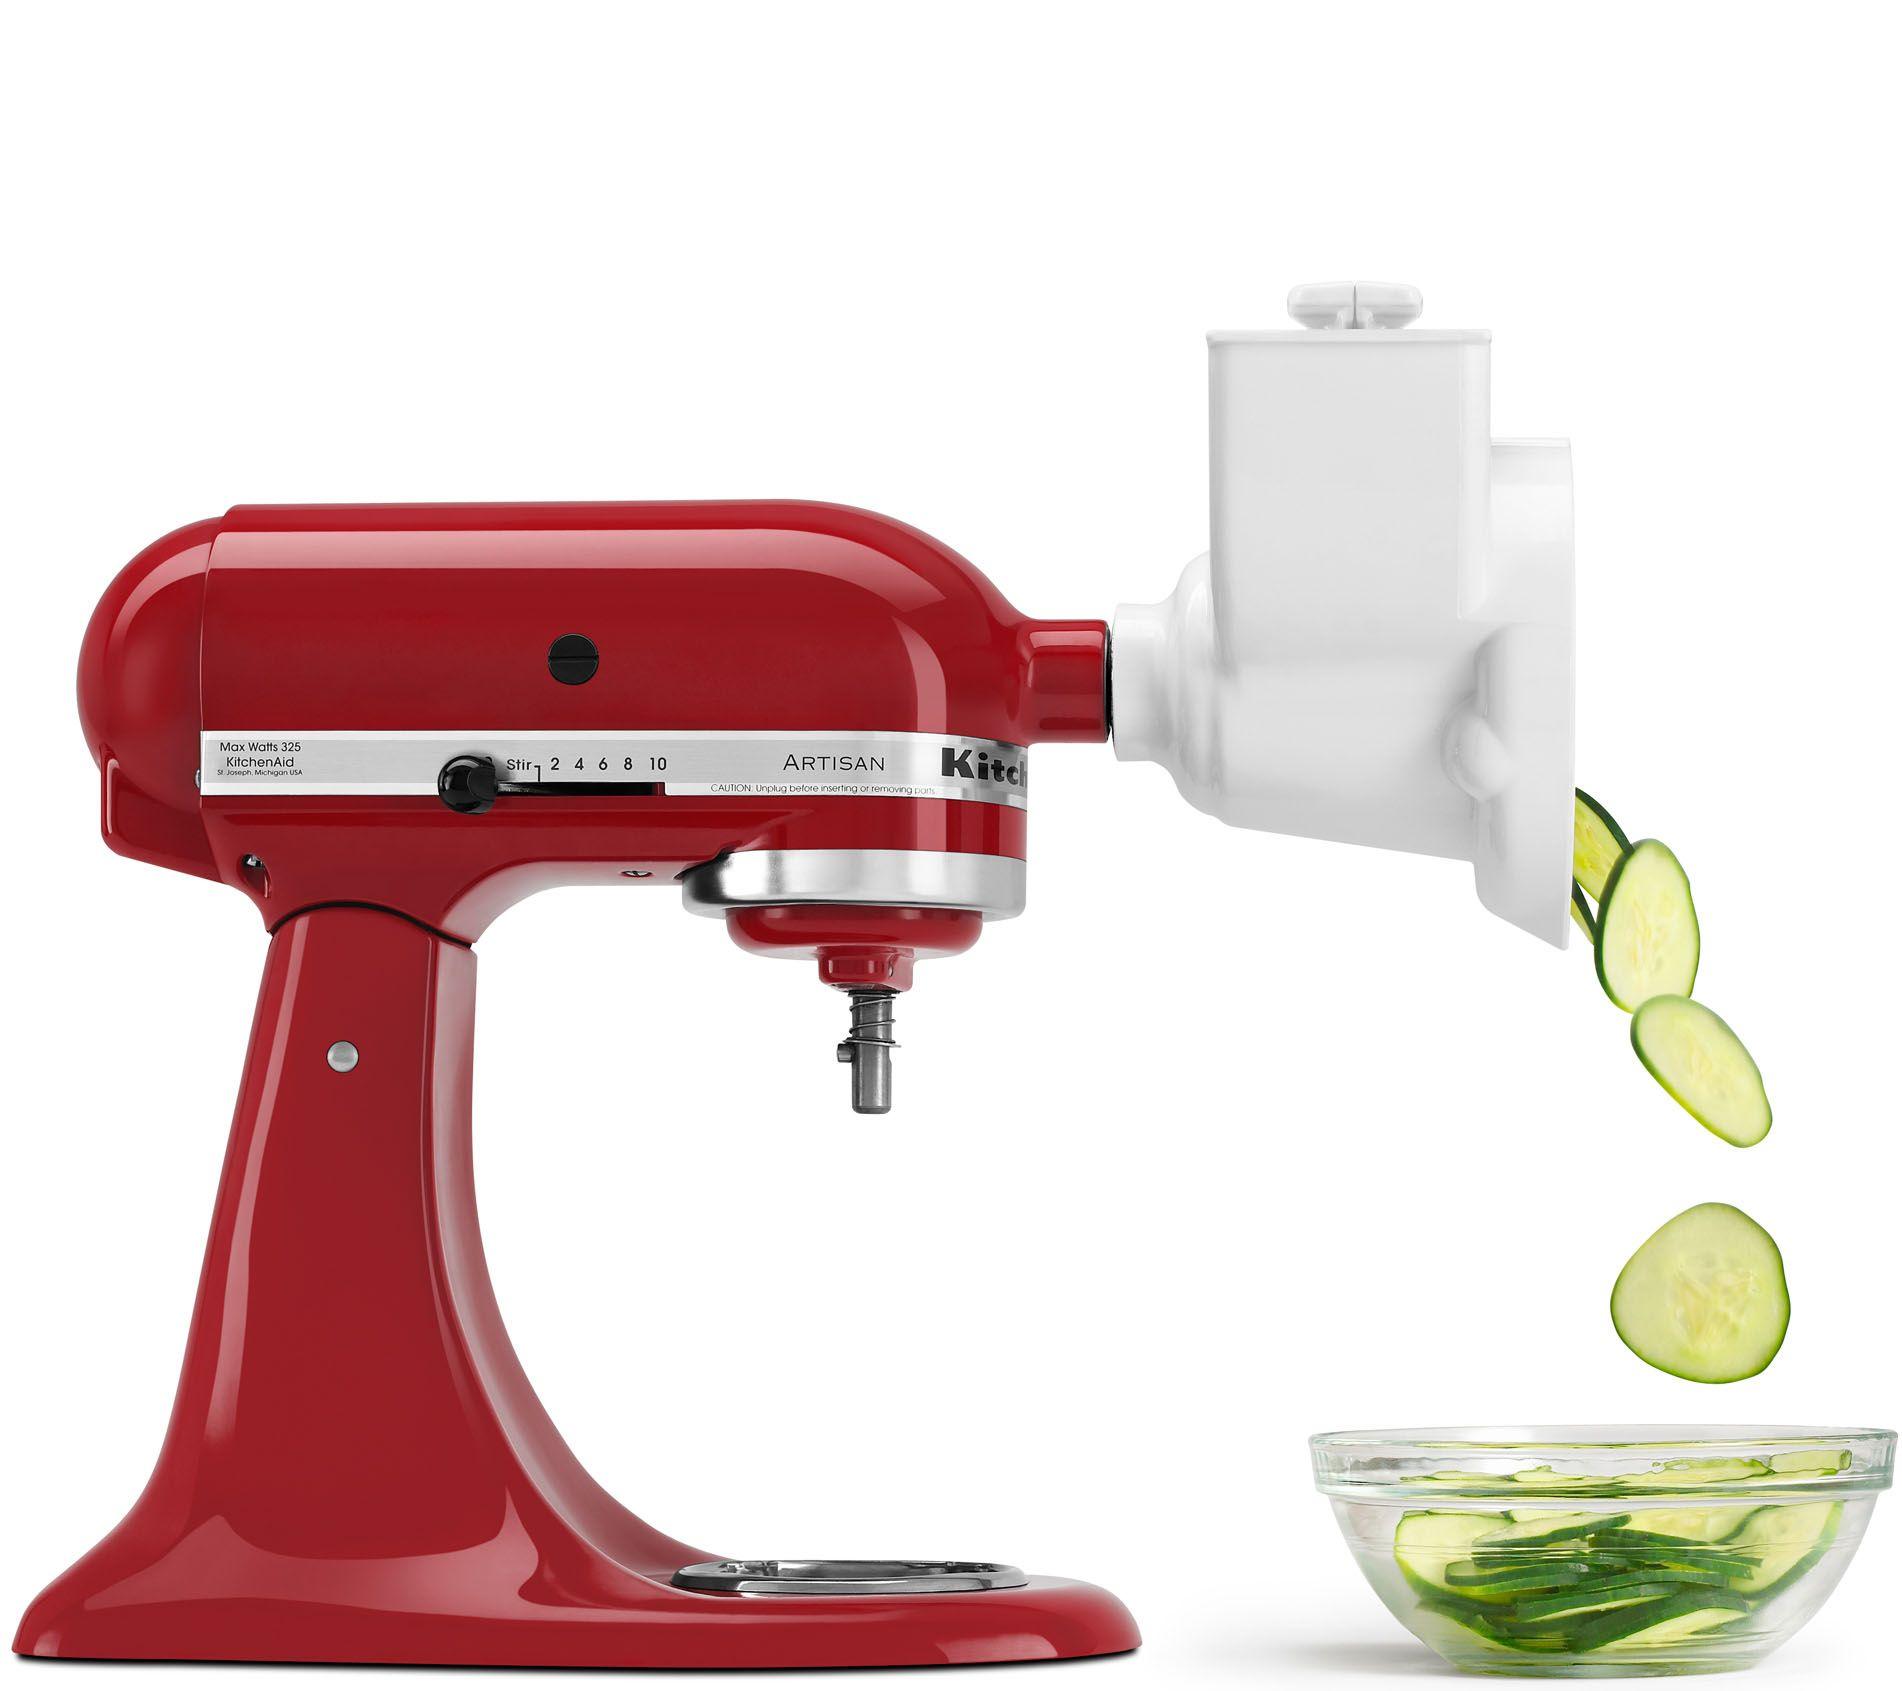 kitchenaid rvsa stand mixer rotor slicer shredder white. Black Bedroom Furniture Sets. Home Design Ideas